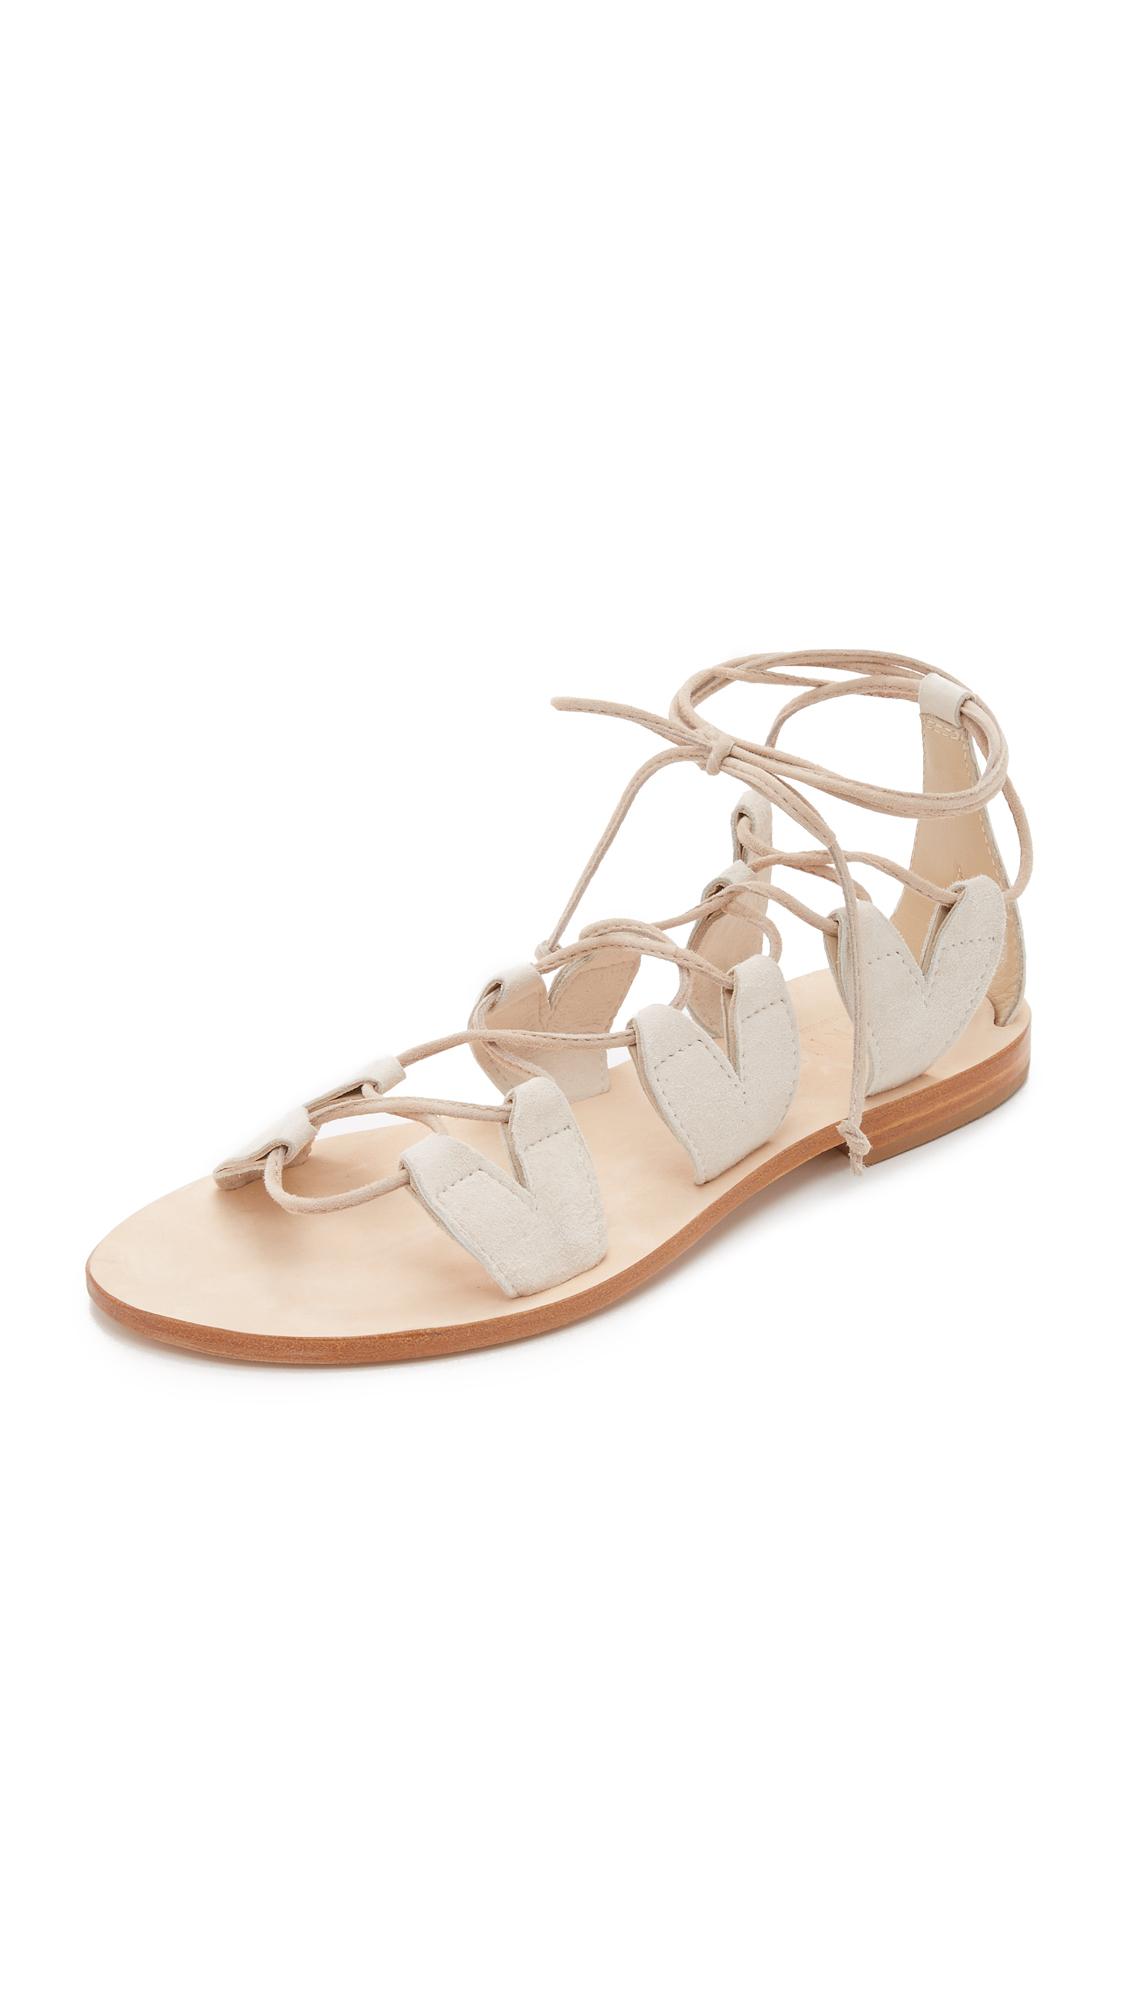 b7dd01976145 Cornetti Innamorati Gladiator Sandals in Natural - Lyst